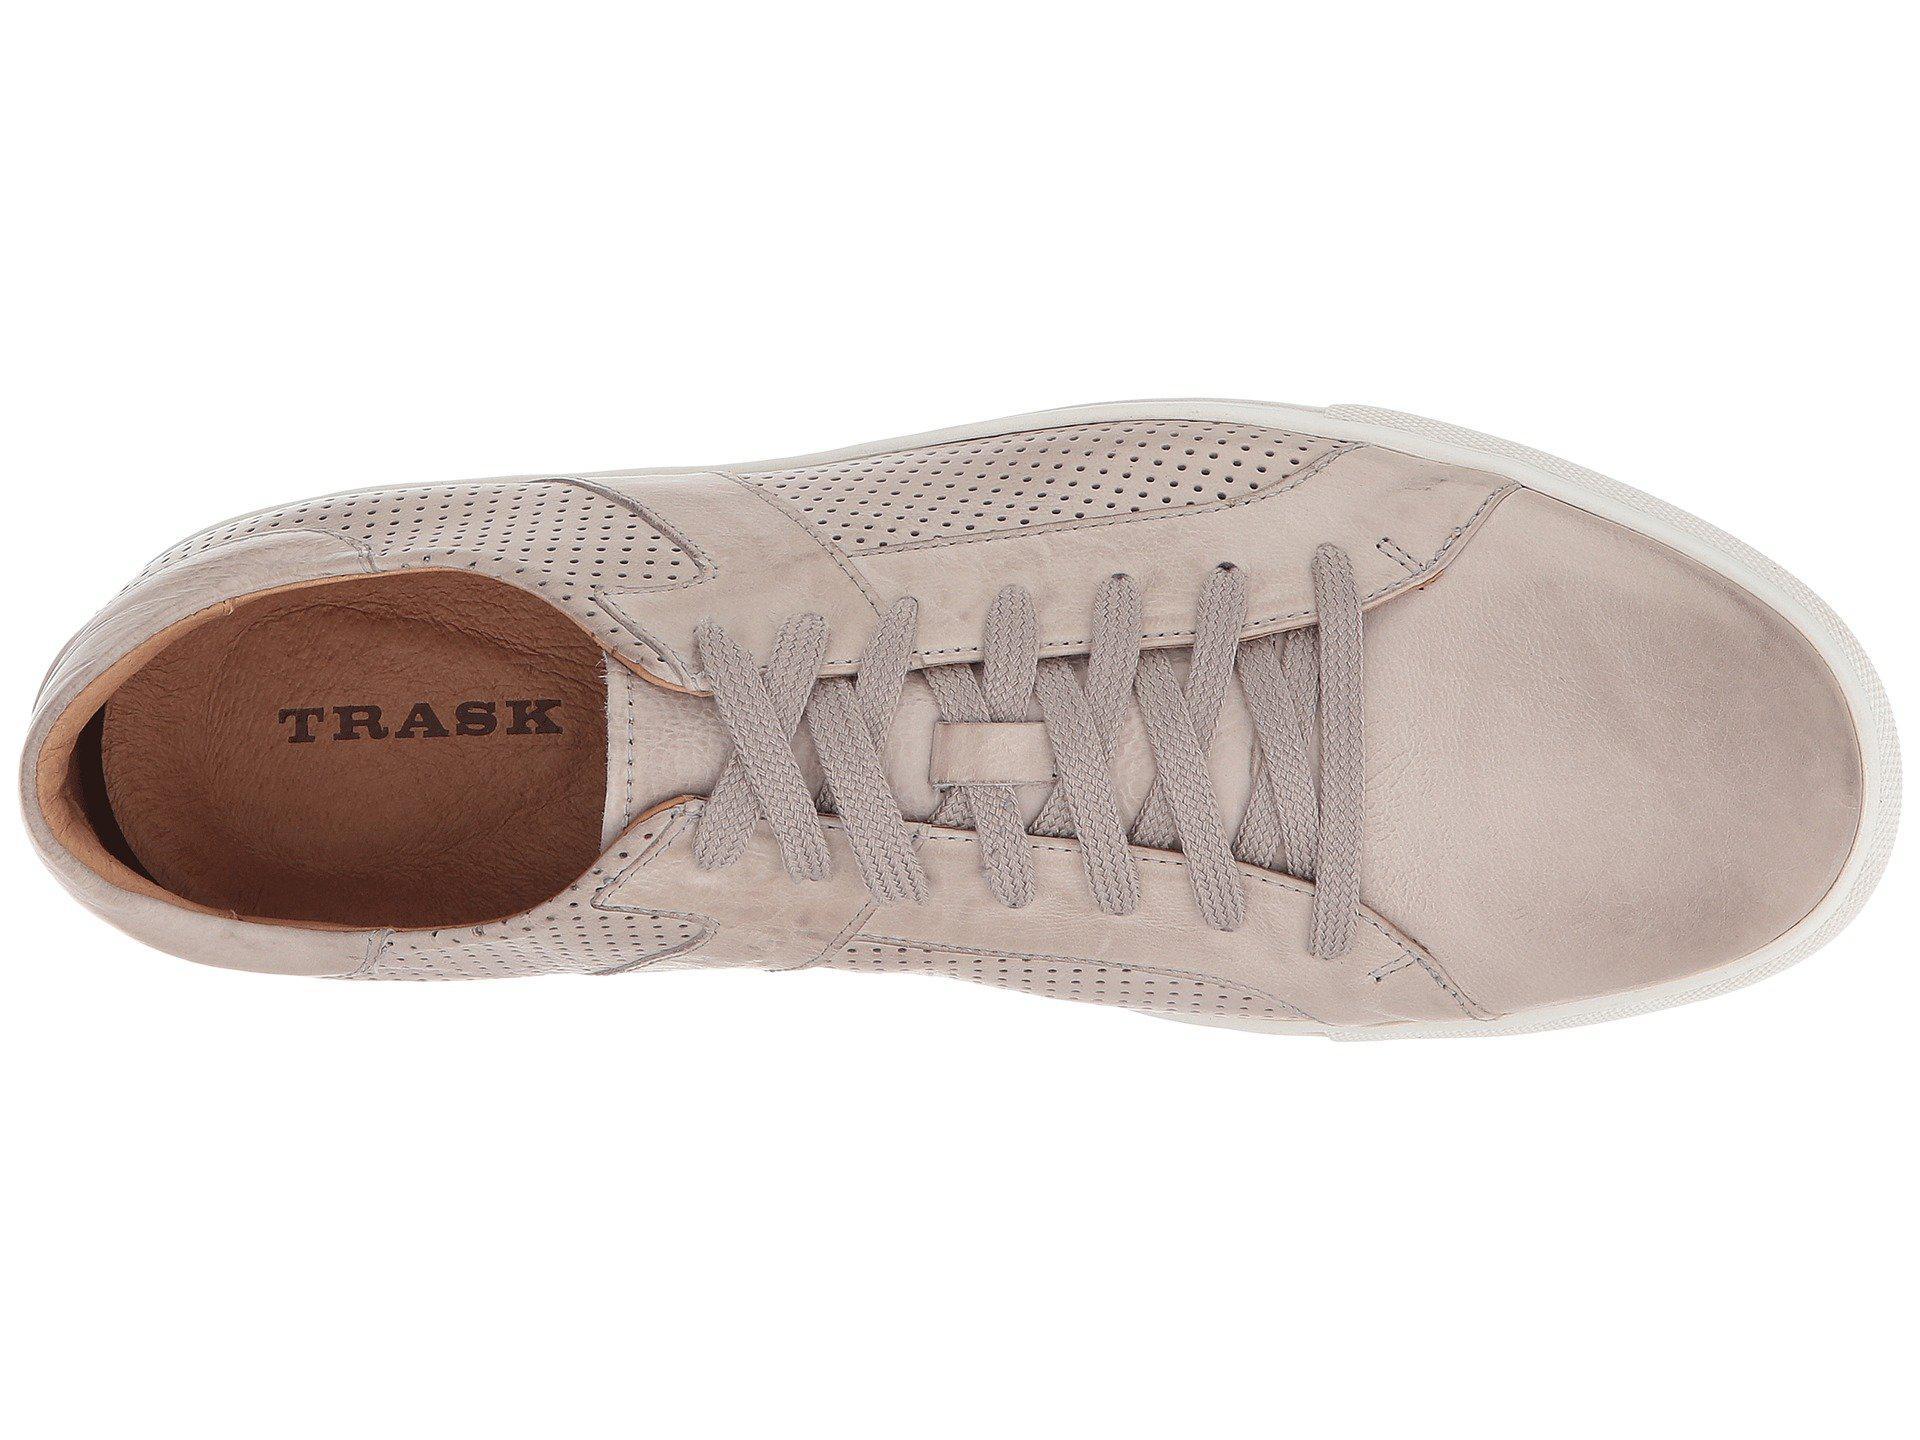 06c5ba23152 Trask Aaron Light Gray Calfskin Mens Flat Shoes Lay back and